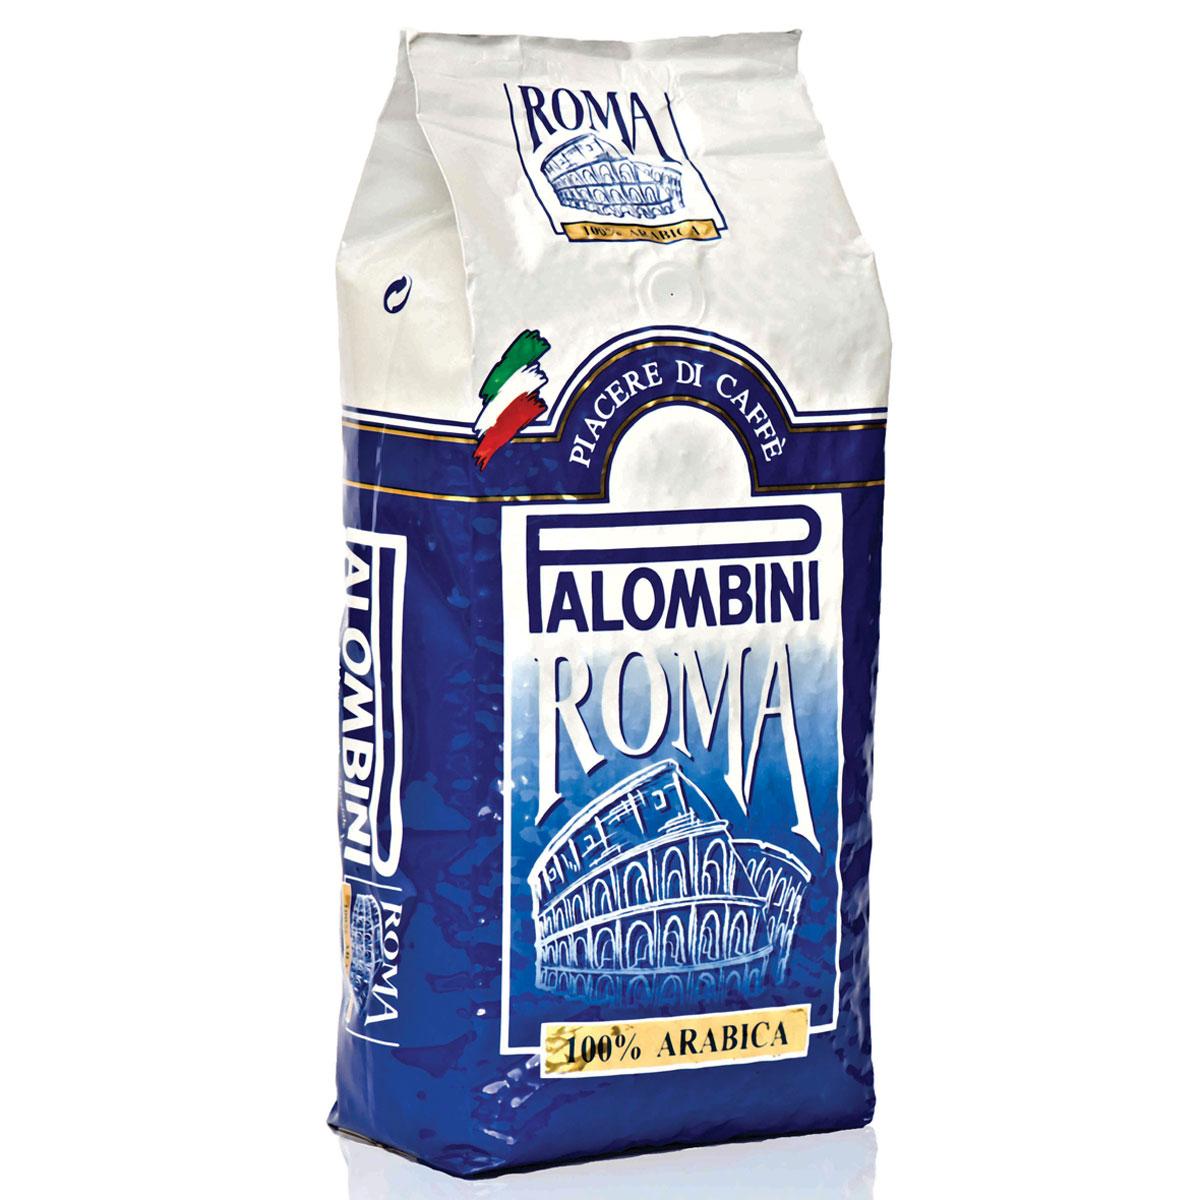 Palombini Roma 100% Arabica кофе в зернах, 1 кг8009785301830